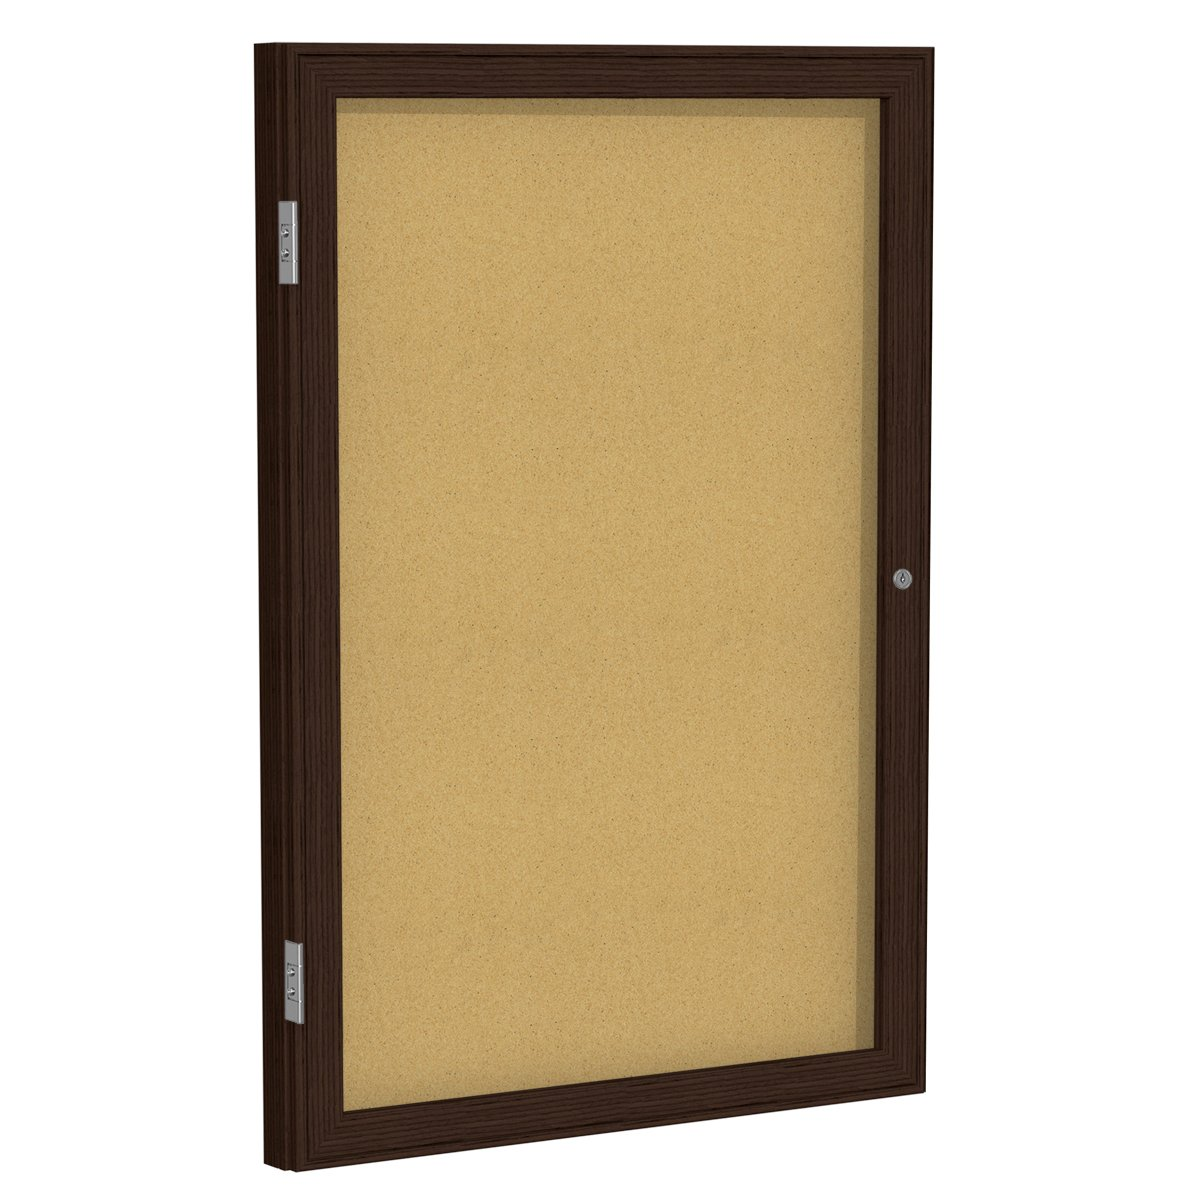 Ghent 24'' x 18'' Wood Frame Walnut Finish Enclosed Bulletin Board, Natural Cork (PN12418K)